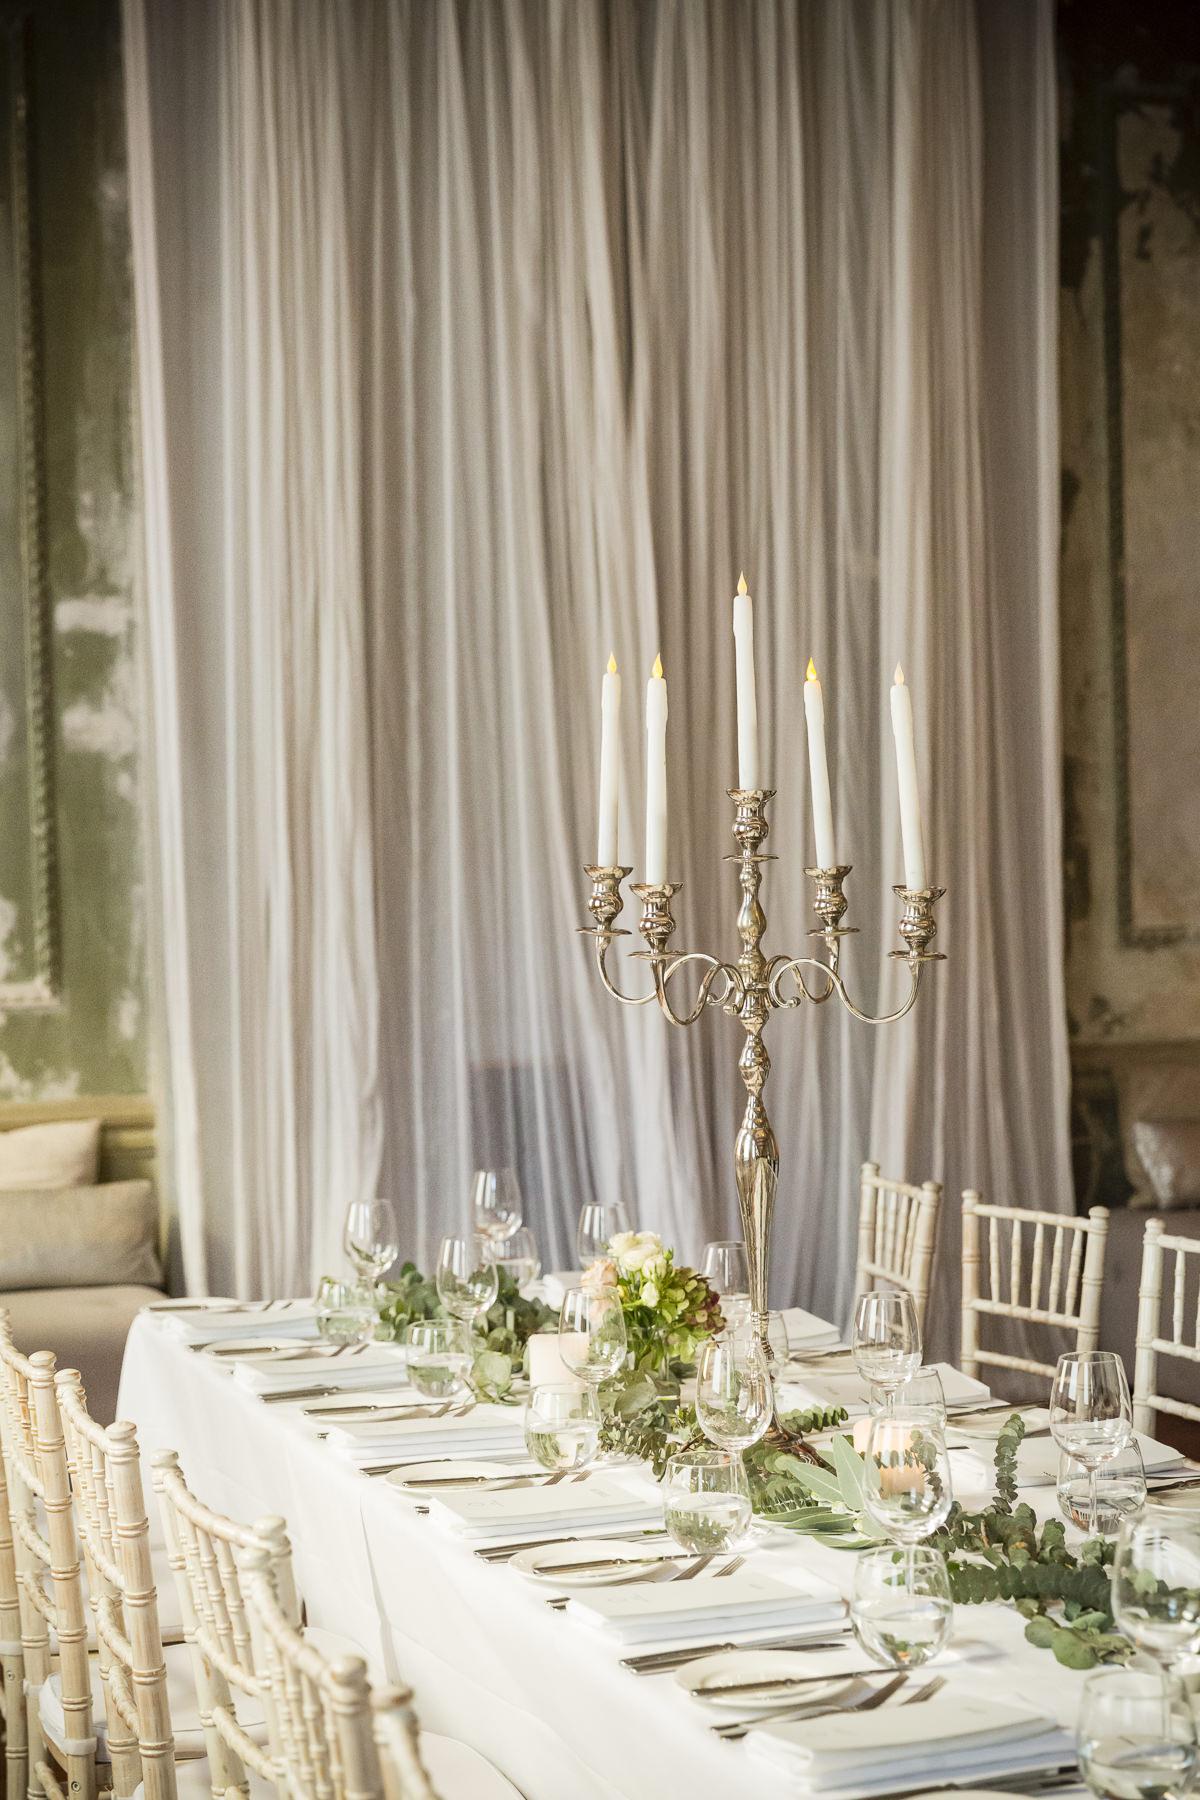 093-gorgeous-george-ballroom-wedding-by-days-like-this.jpg